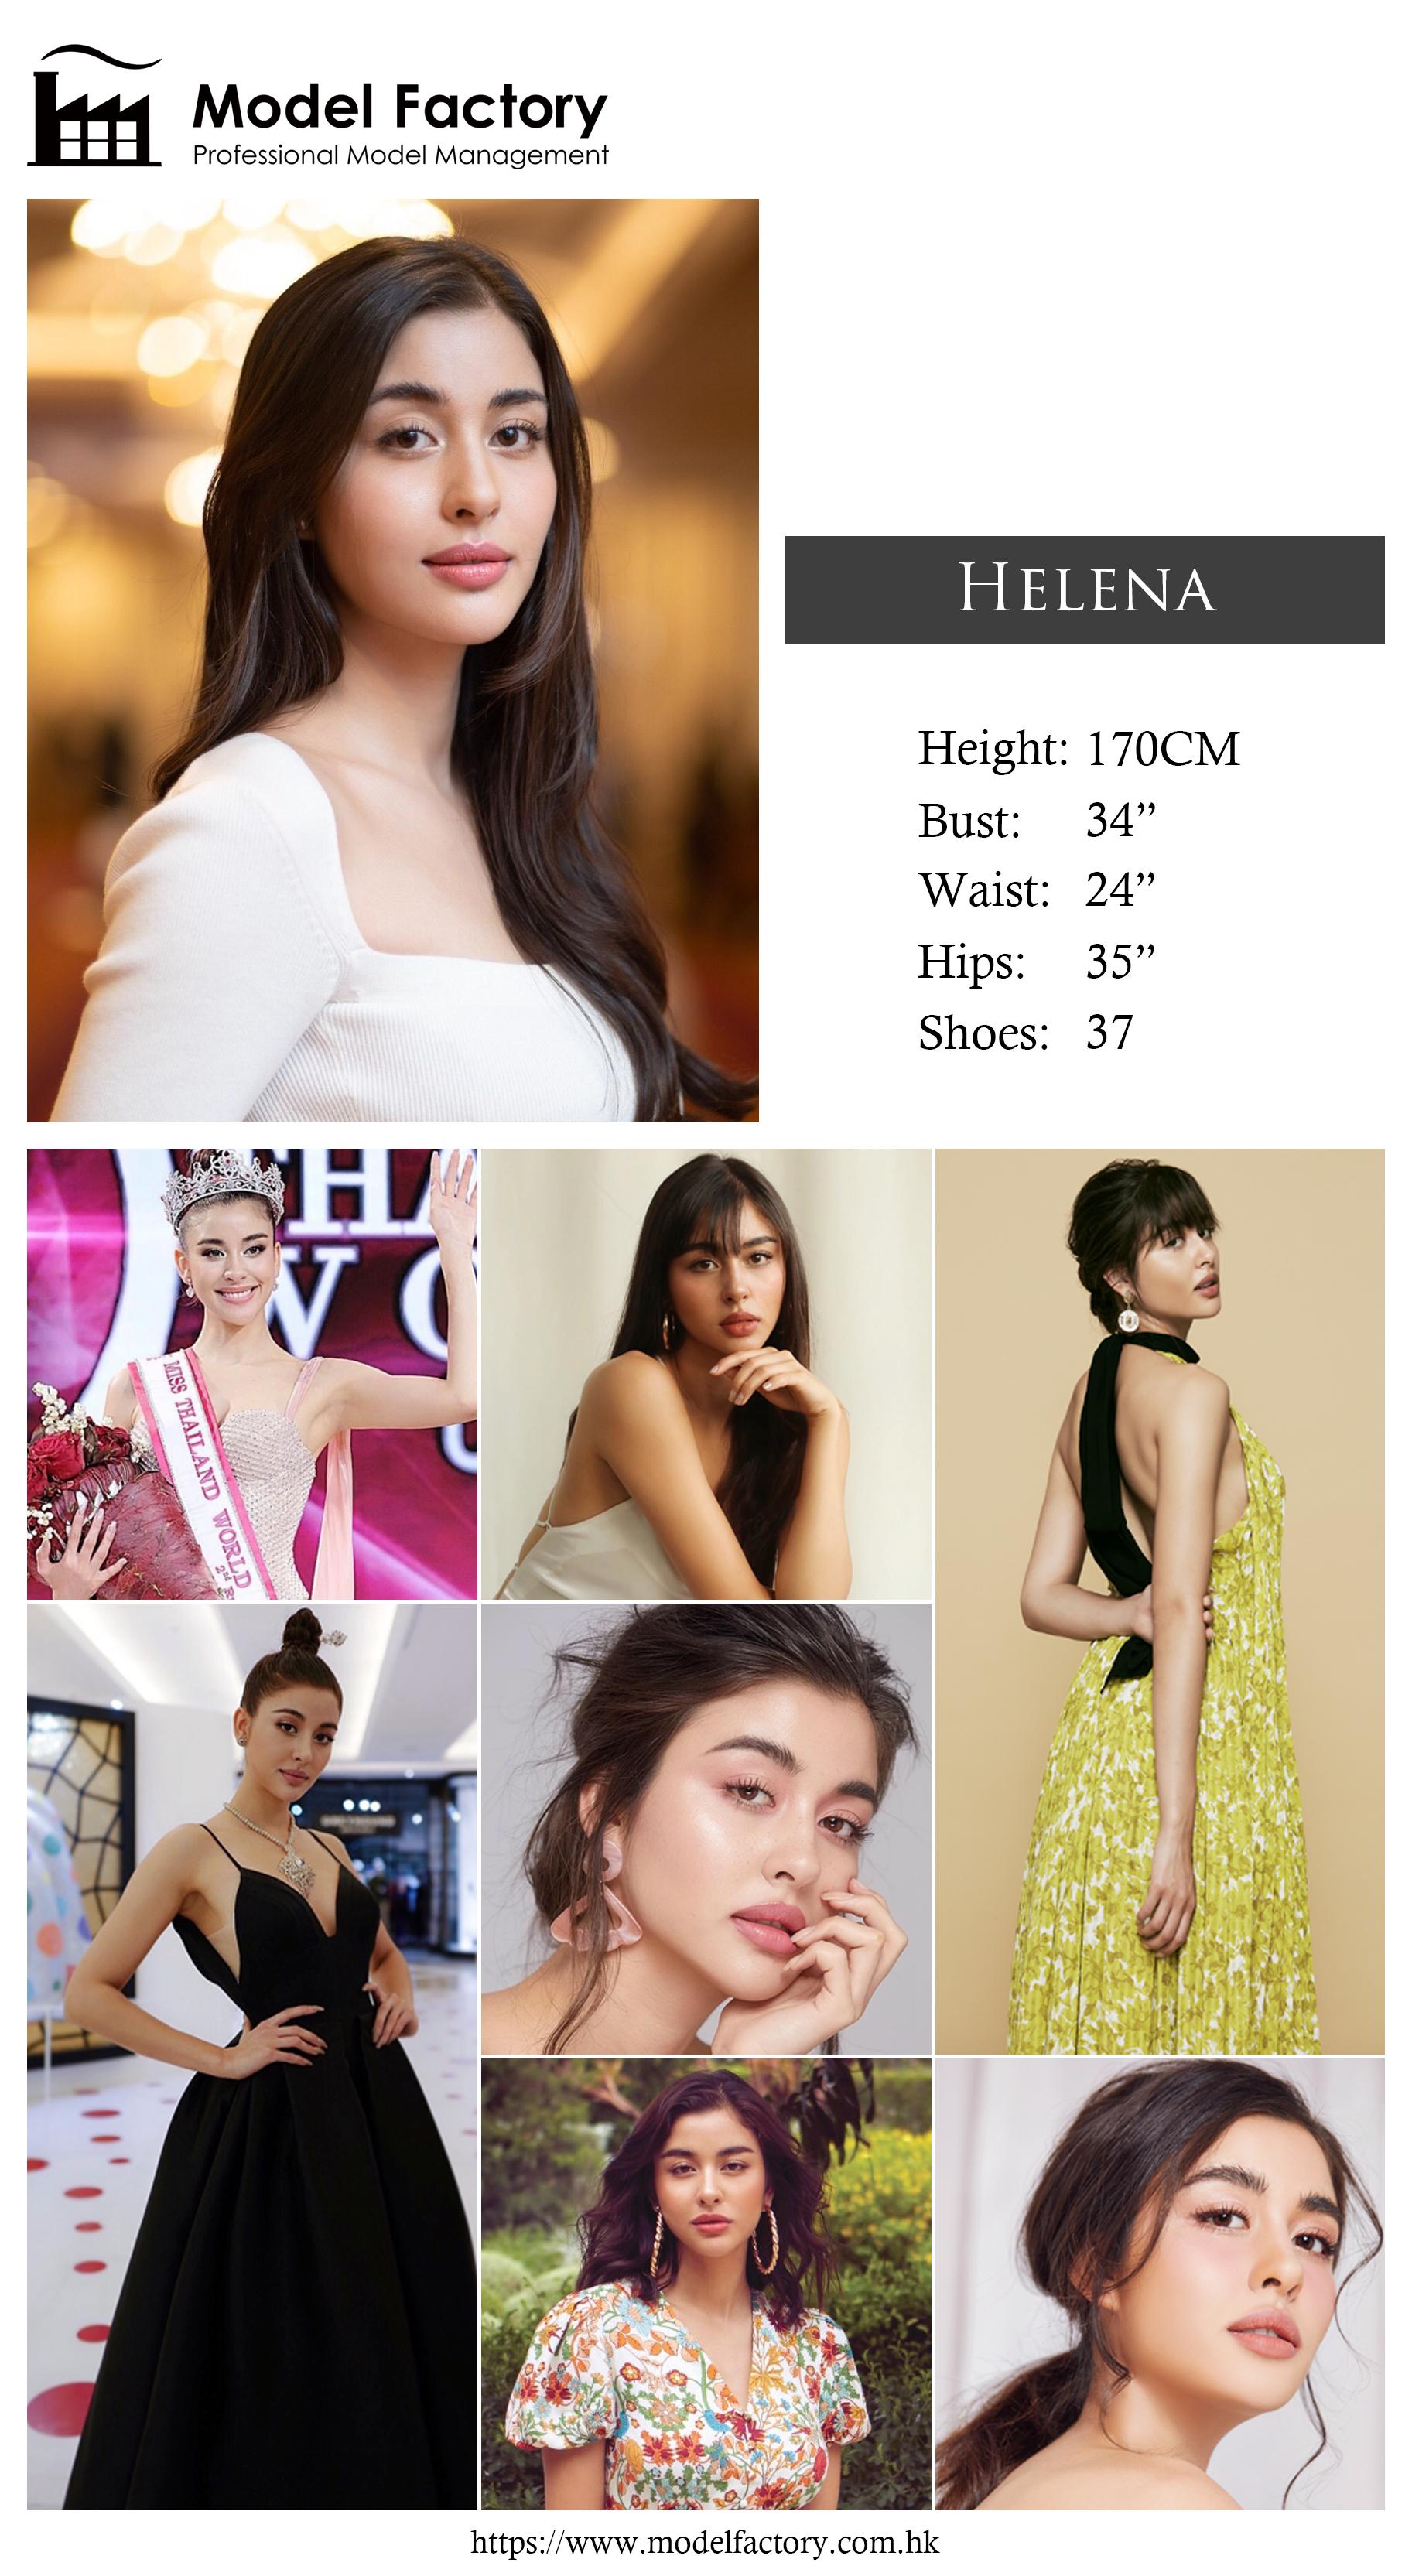 Model Factory Caucasian Female Model Helena